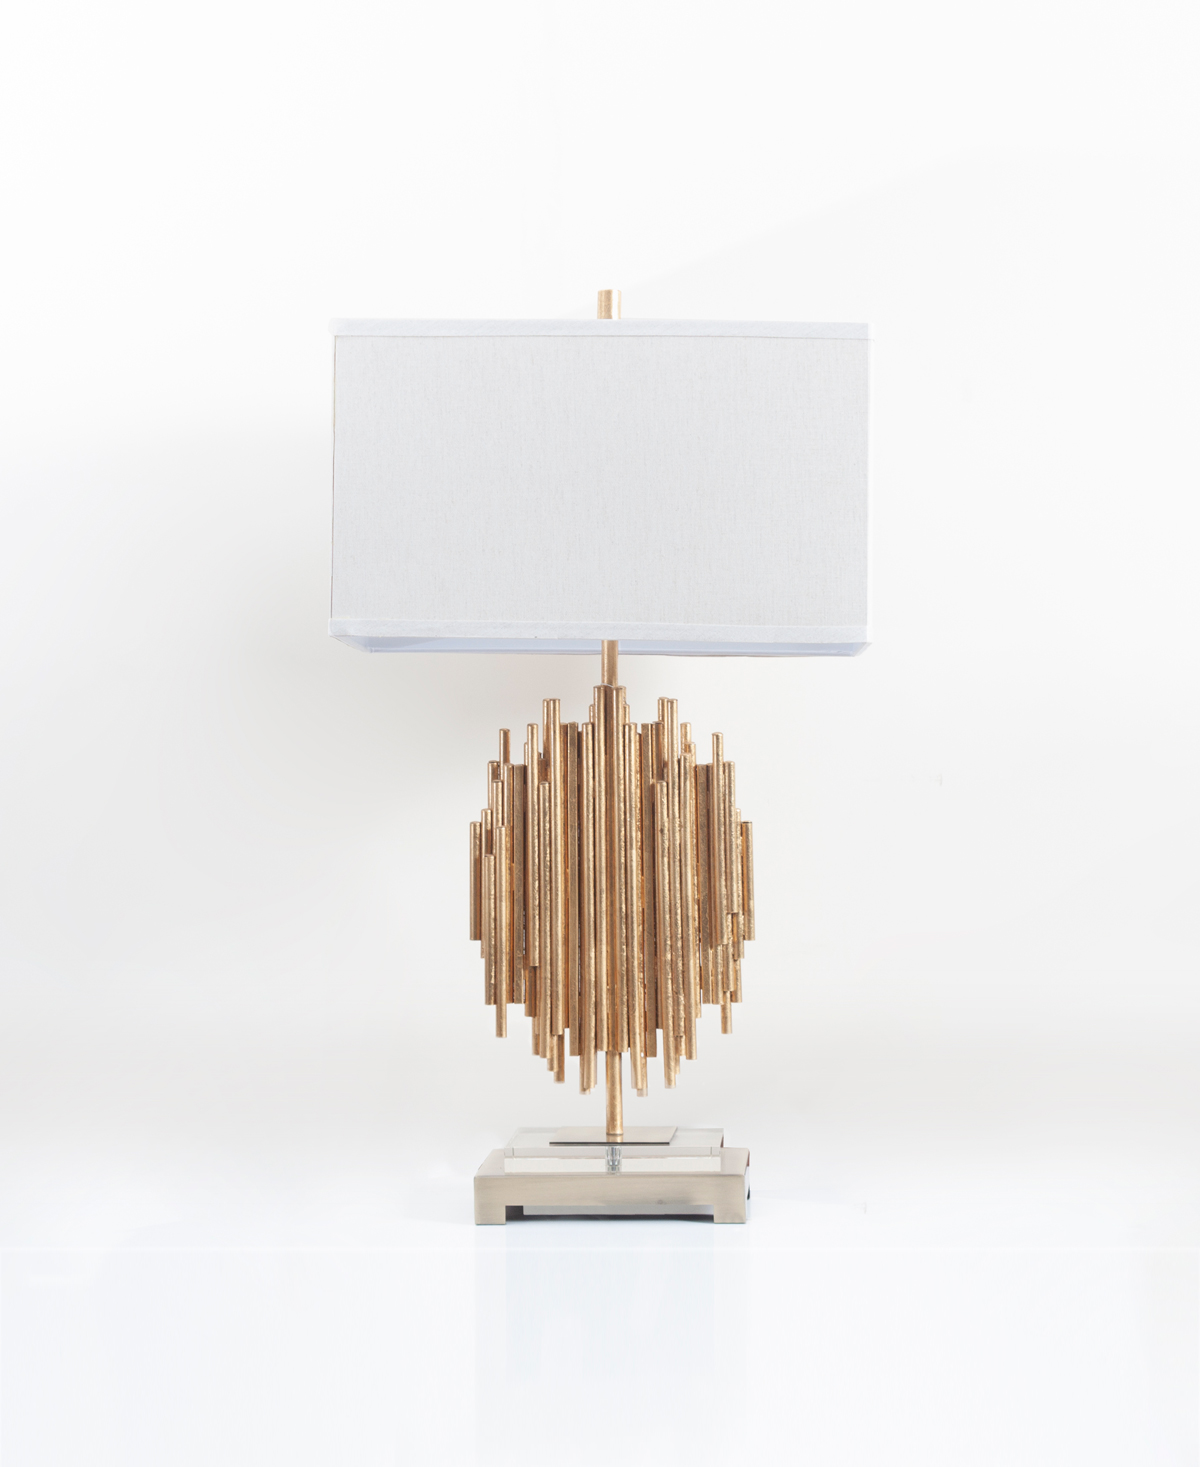 LAMPARA-CVAER962